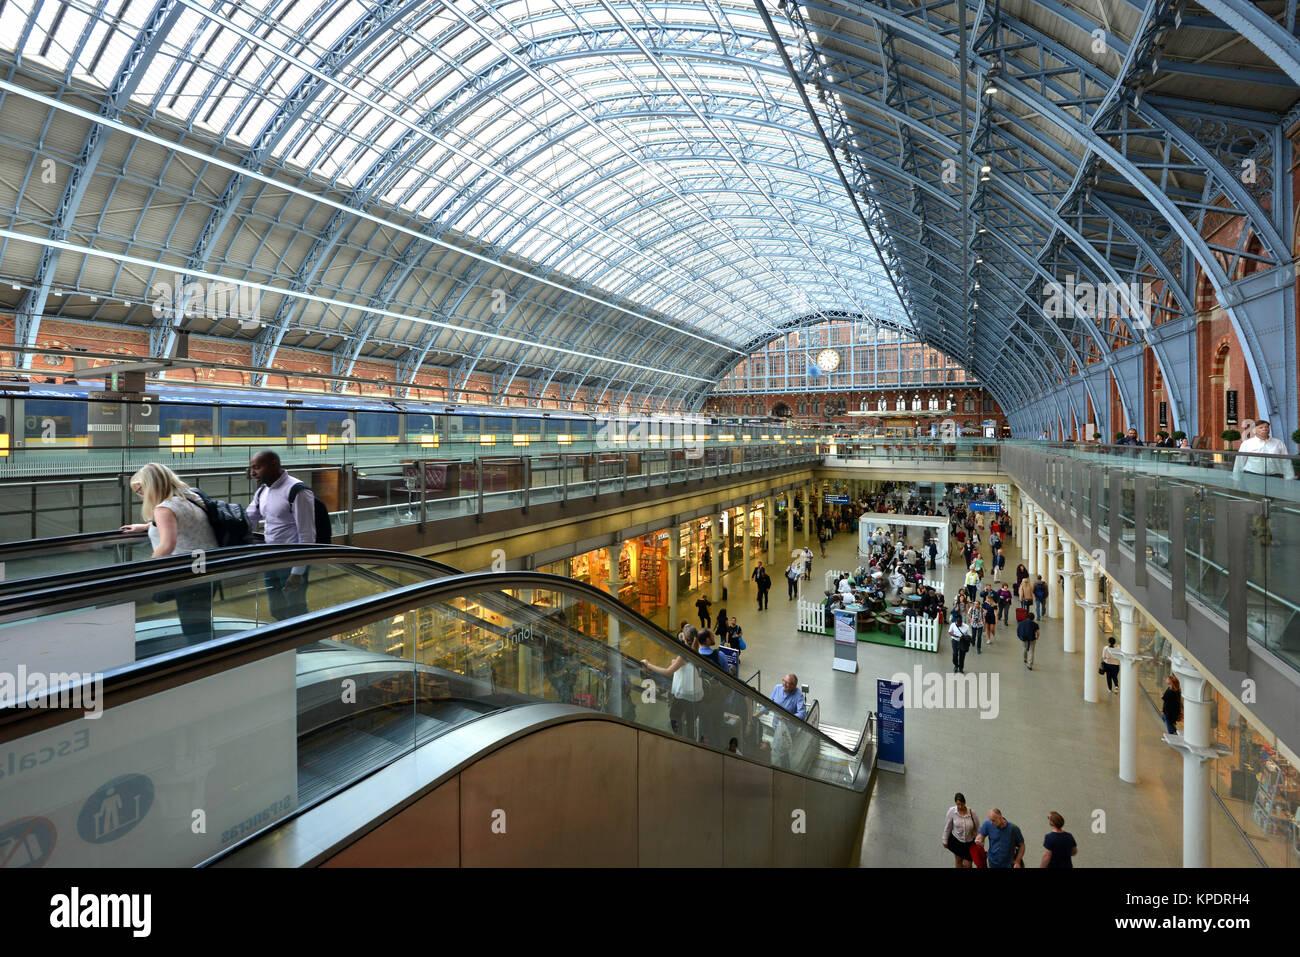 St Pancras Station, London. - Stock Image